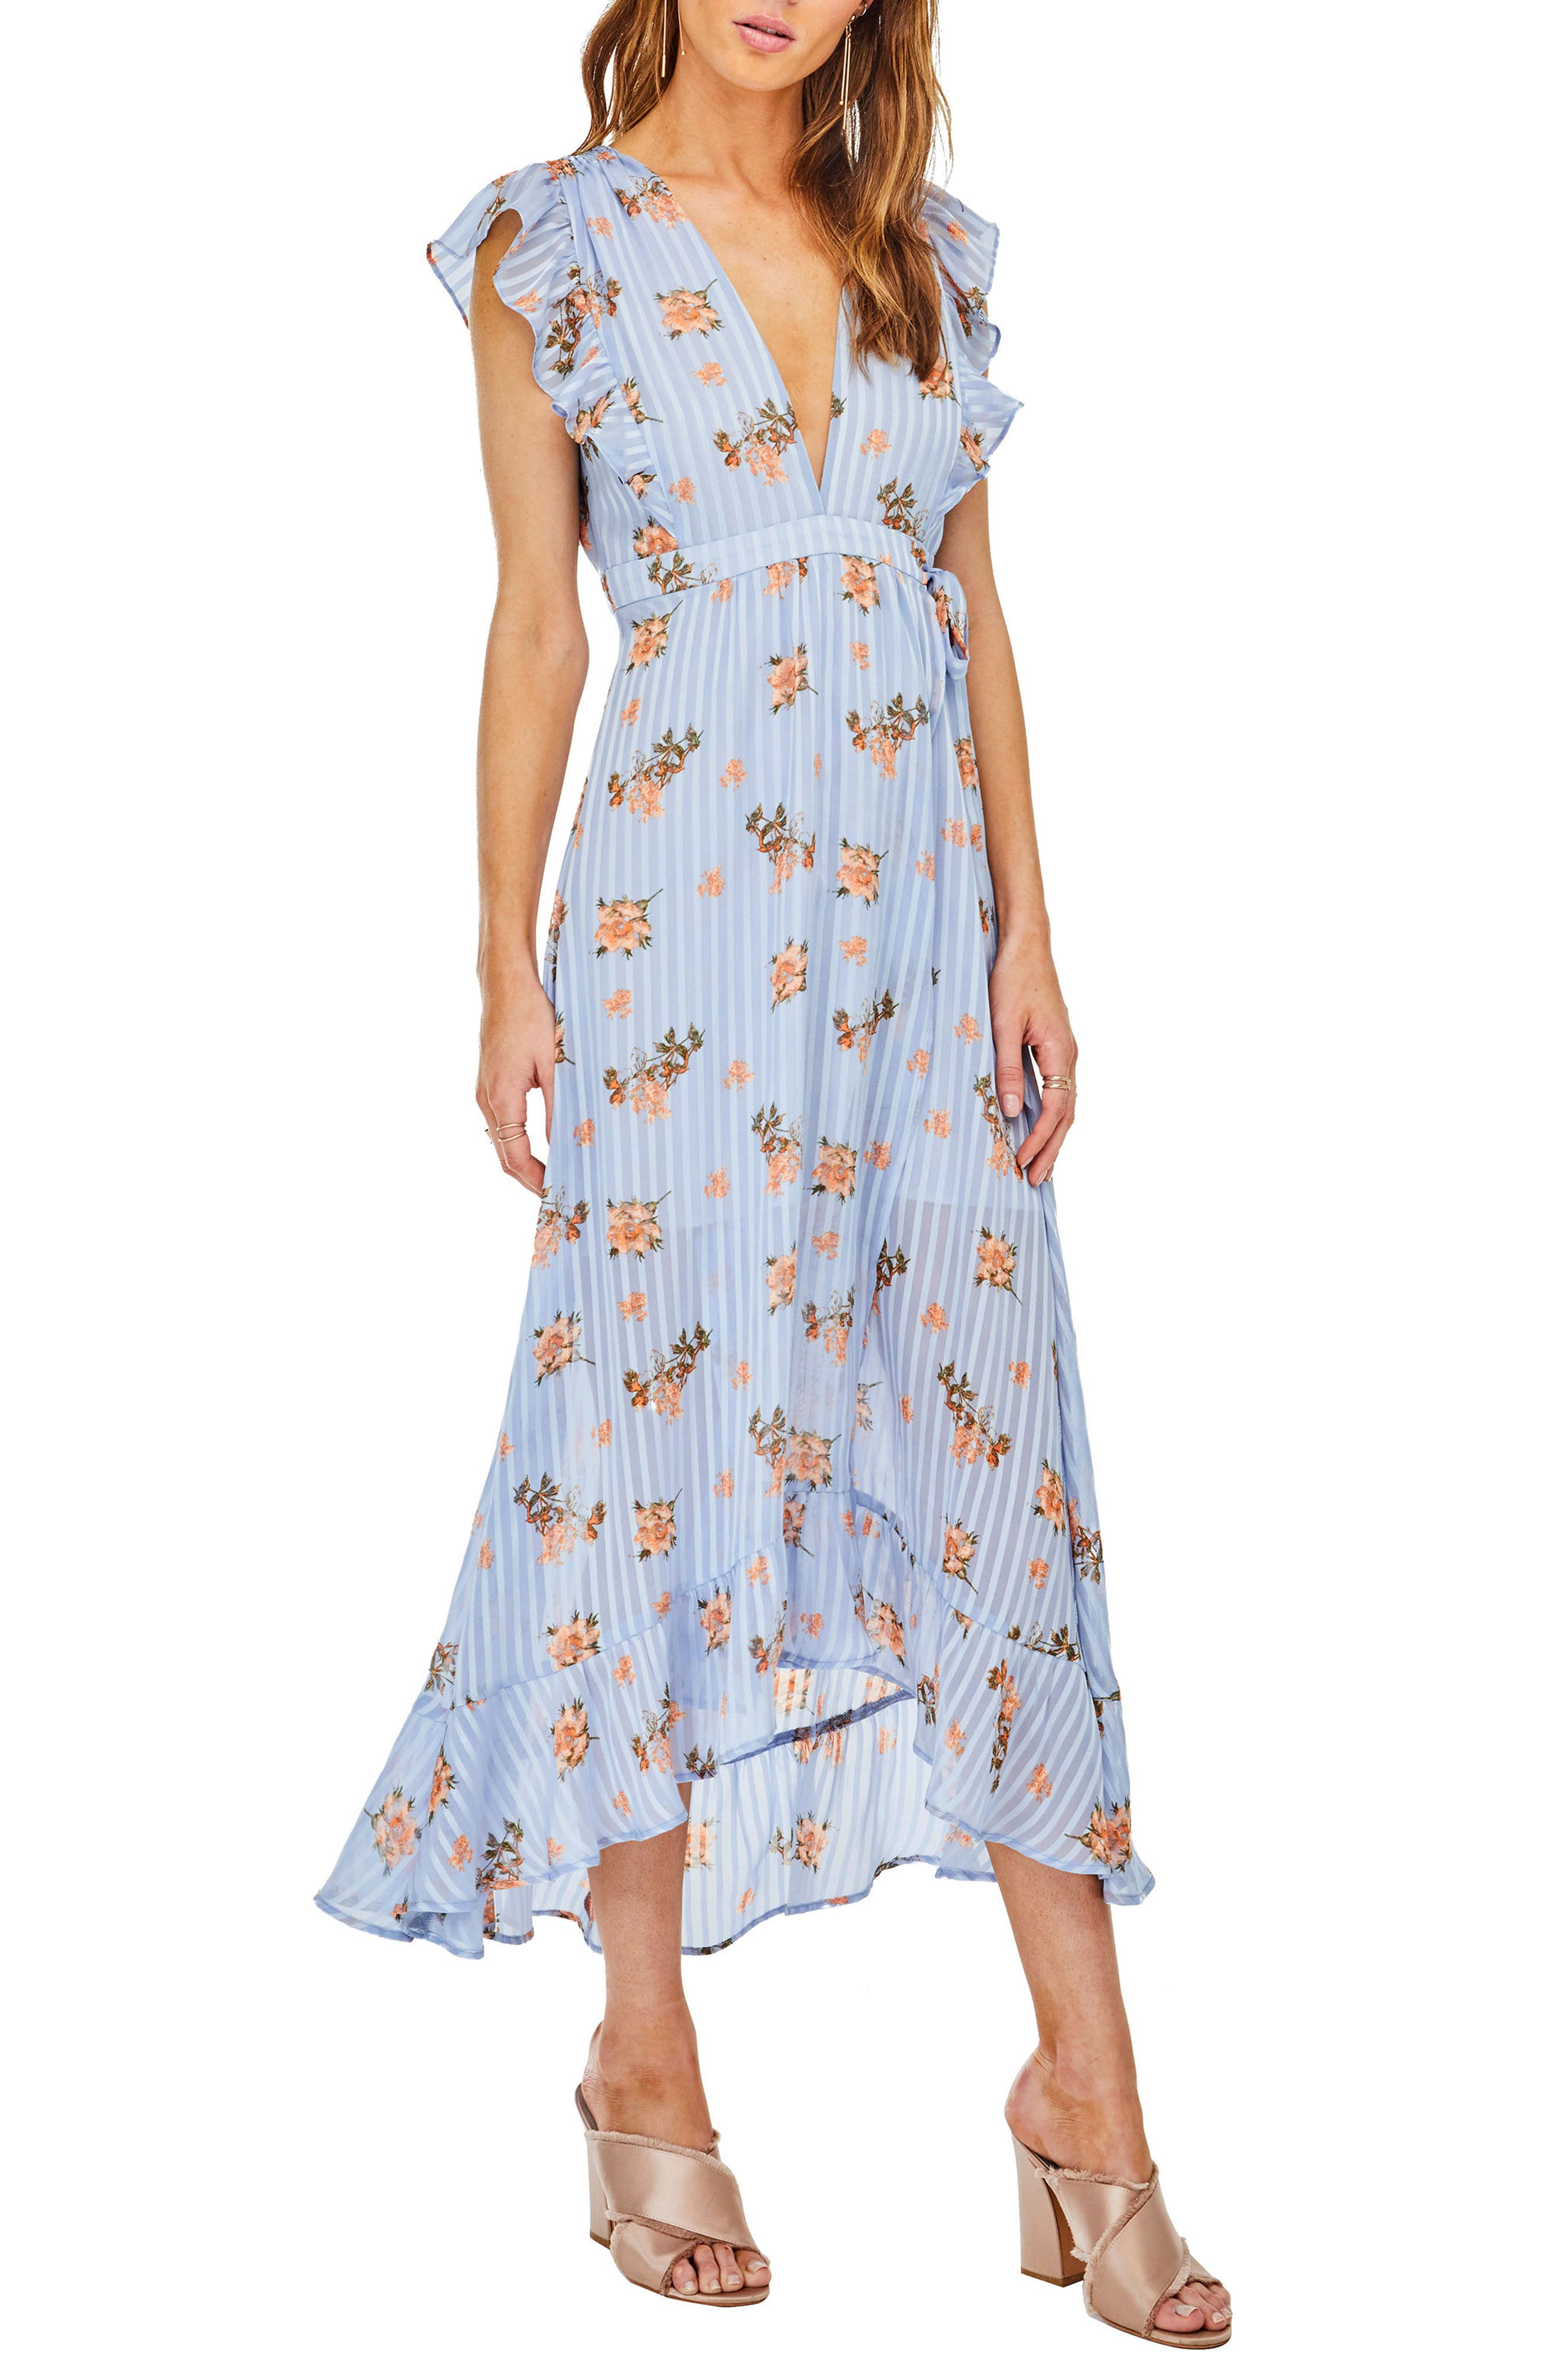 Lila Midi Dress,                             Main thumbnail 1, color,                             Blue/Peach Floral